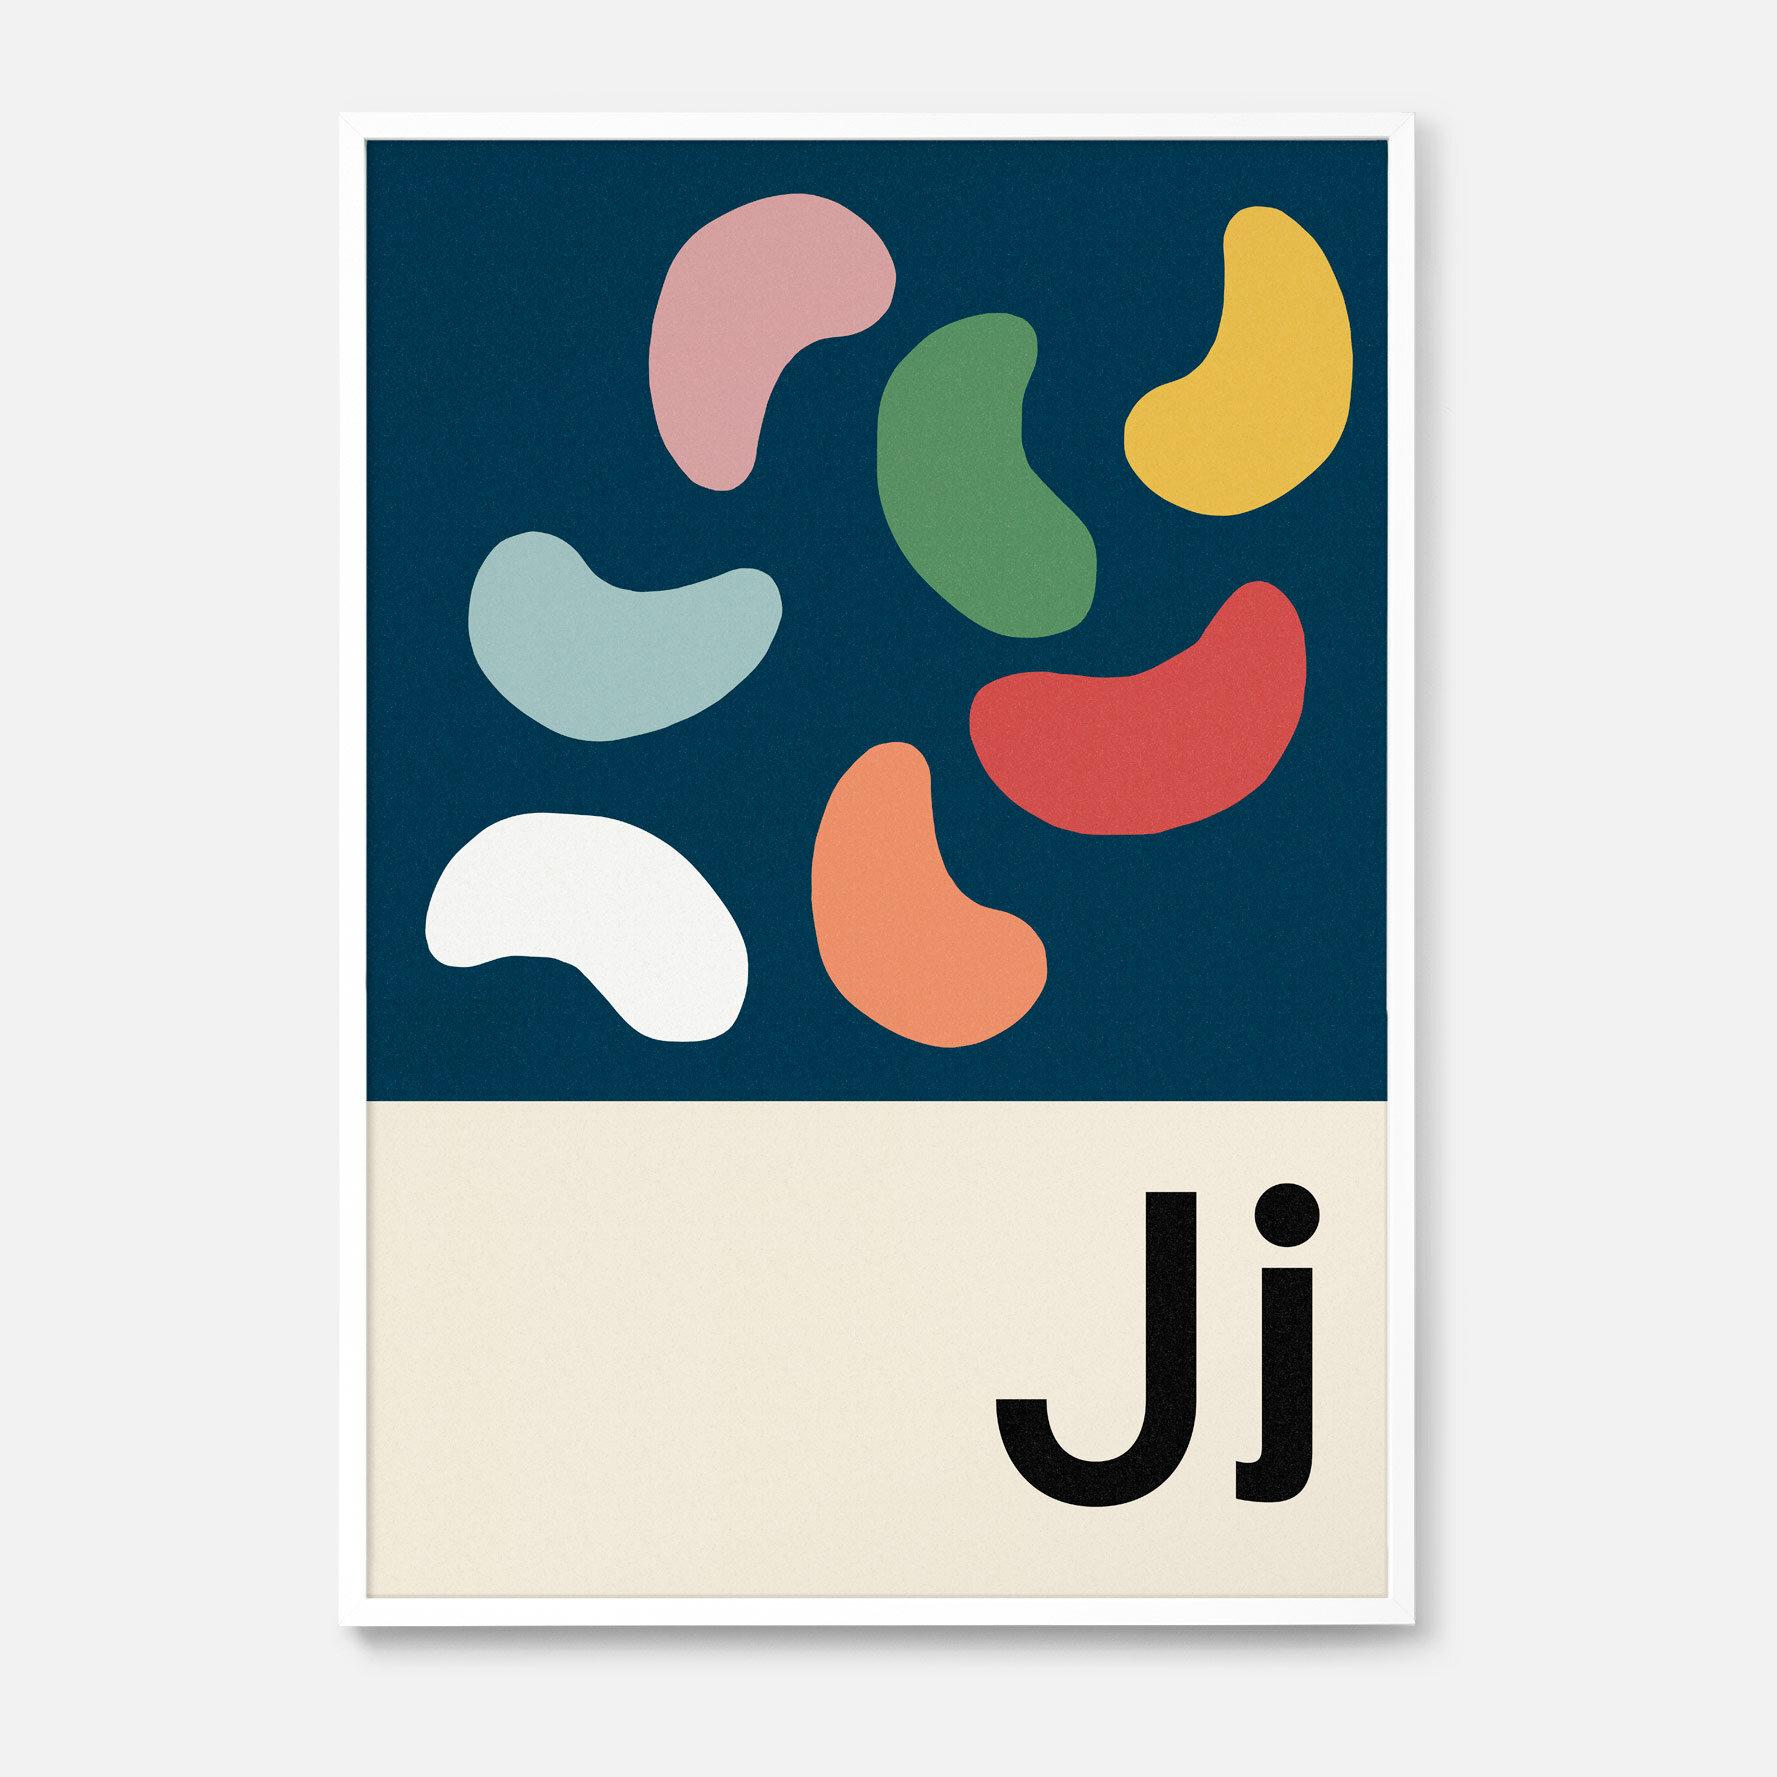 HeyWow-Alphabet-print-jellybeans-frame.jpg